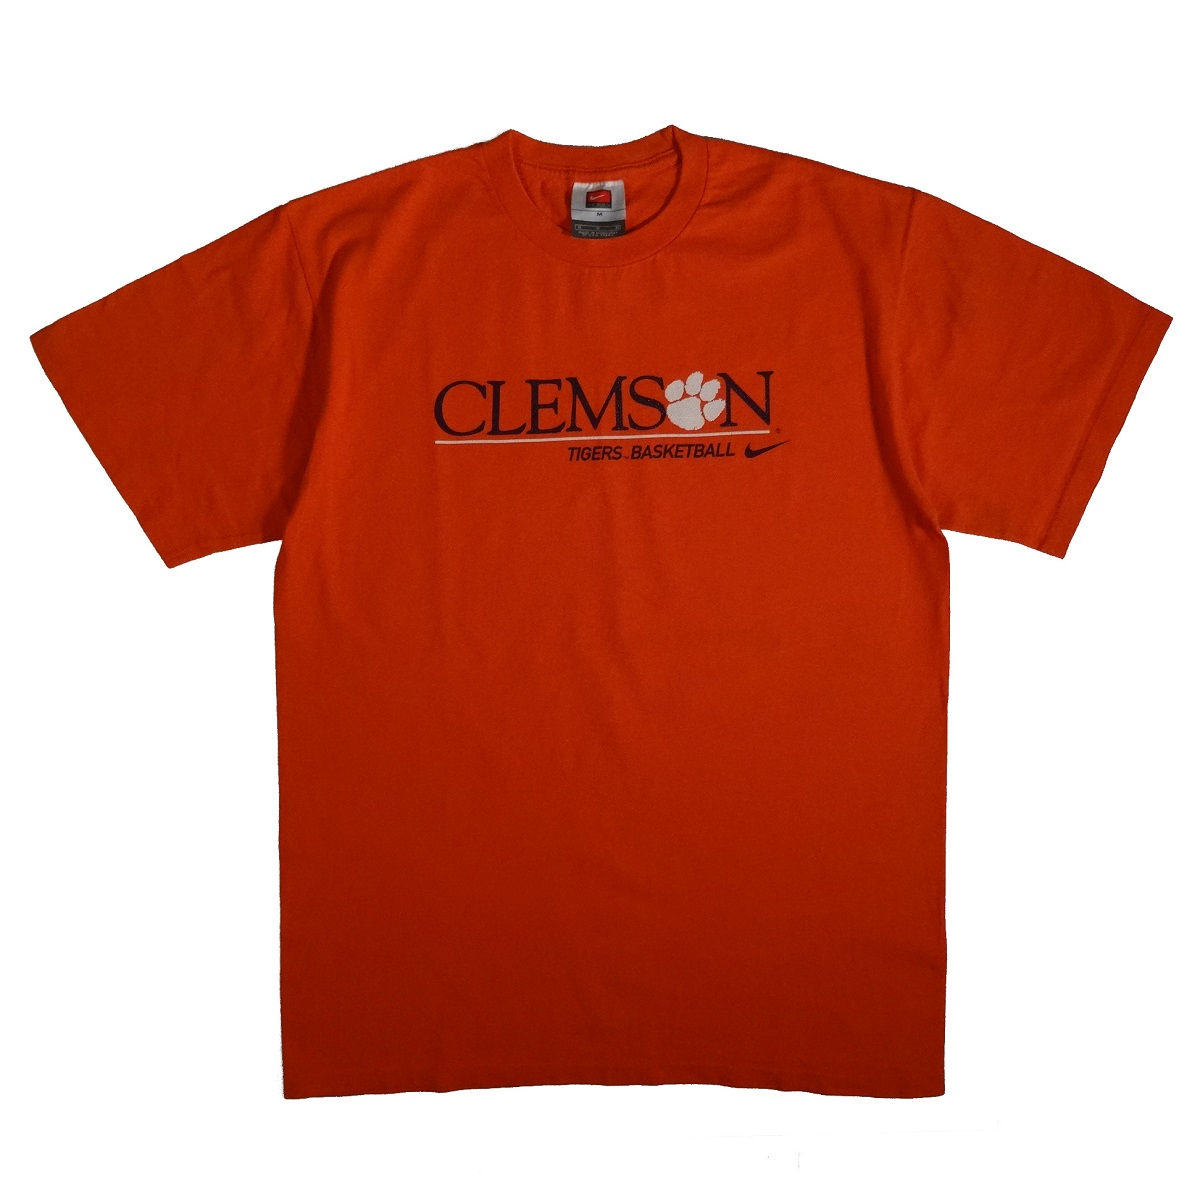 Clemson Tigers Basketball Nike T Shirt Front